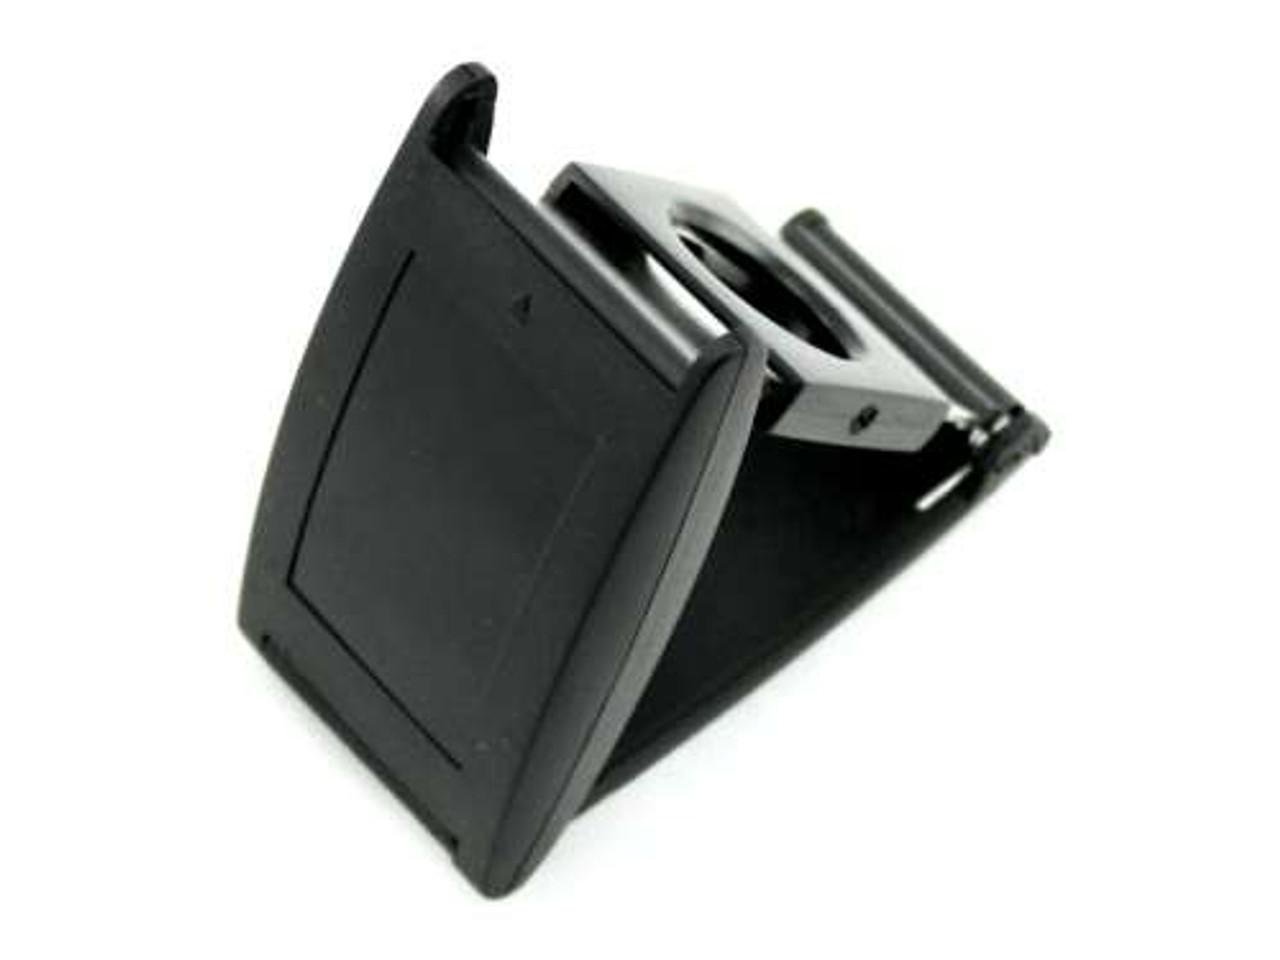 Drake Foldable Cigar Cutter